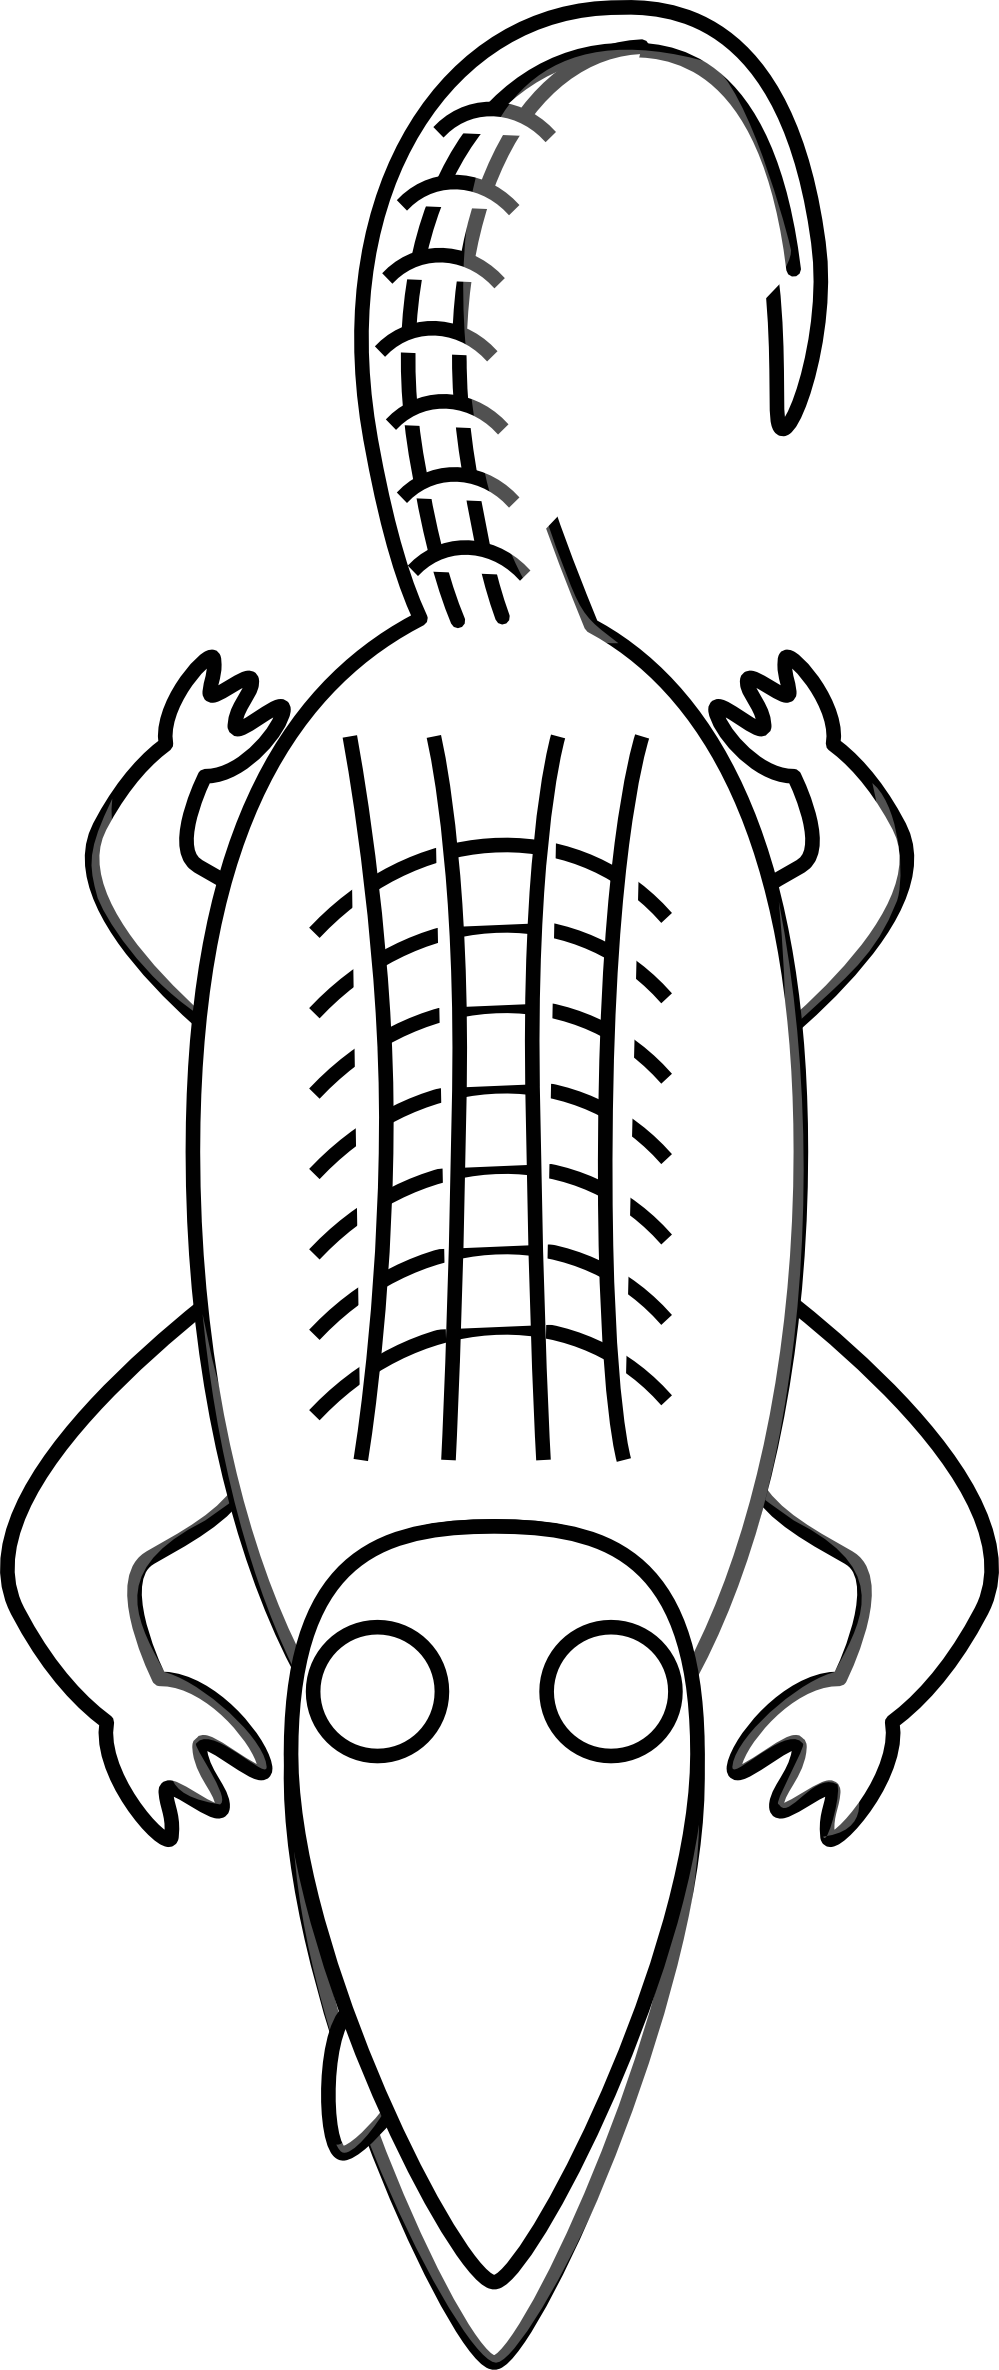 Orange clipart gator. Alligator black and white